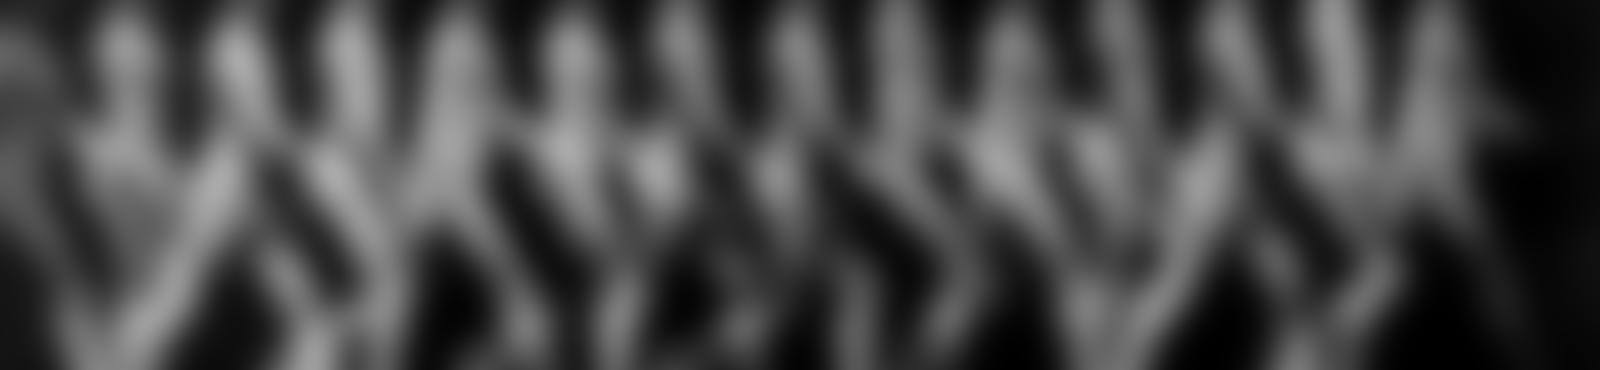 Blurred 0f6afa6b 6d9c 48e8 924c 6bdac8d2dea7